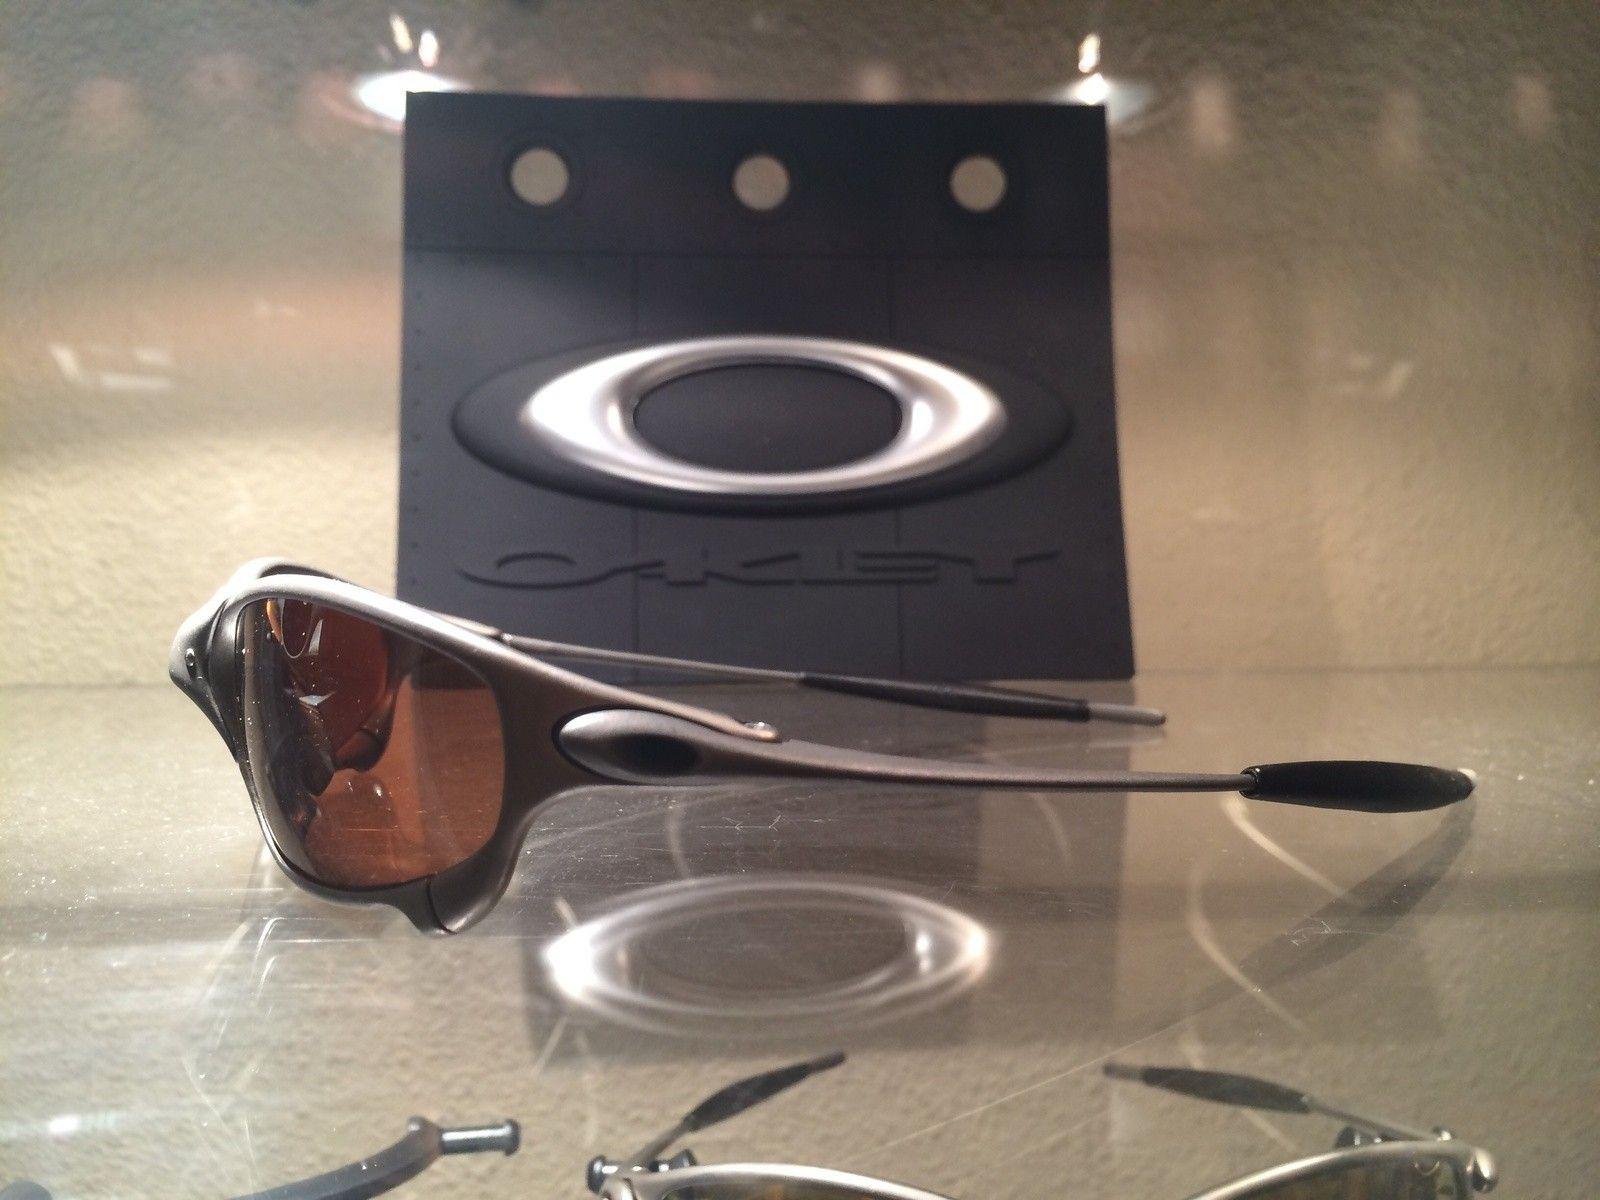 Fernando Xmetal's Thread To Sales ( News: Juliet ti02/vr28 #SOLD ) - image.jpg